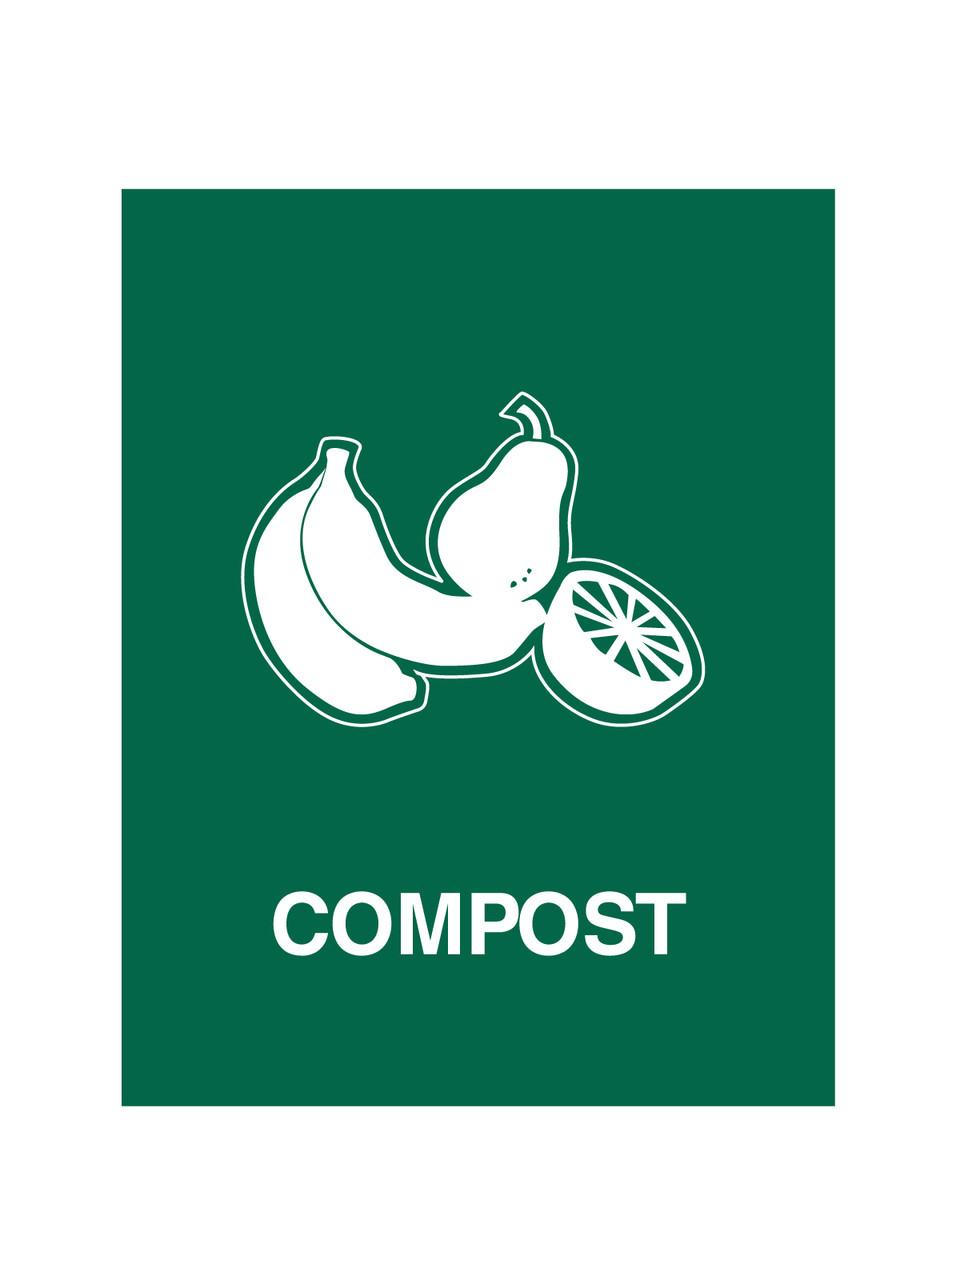 Compost Green